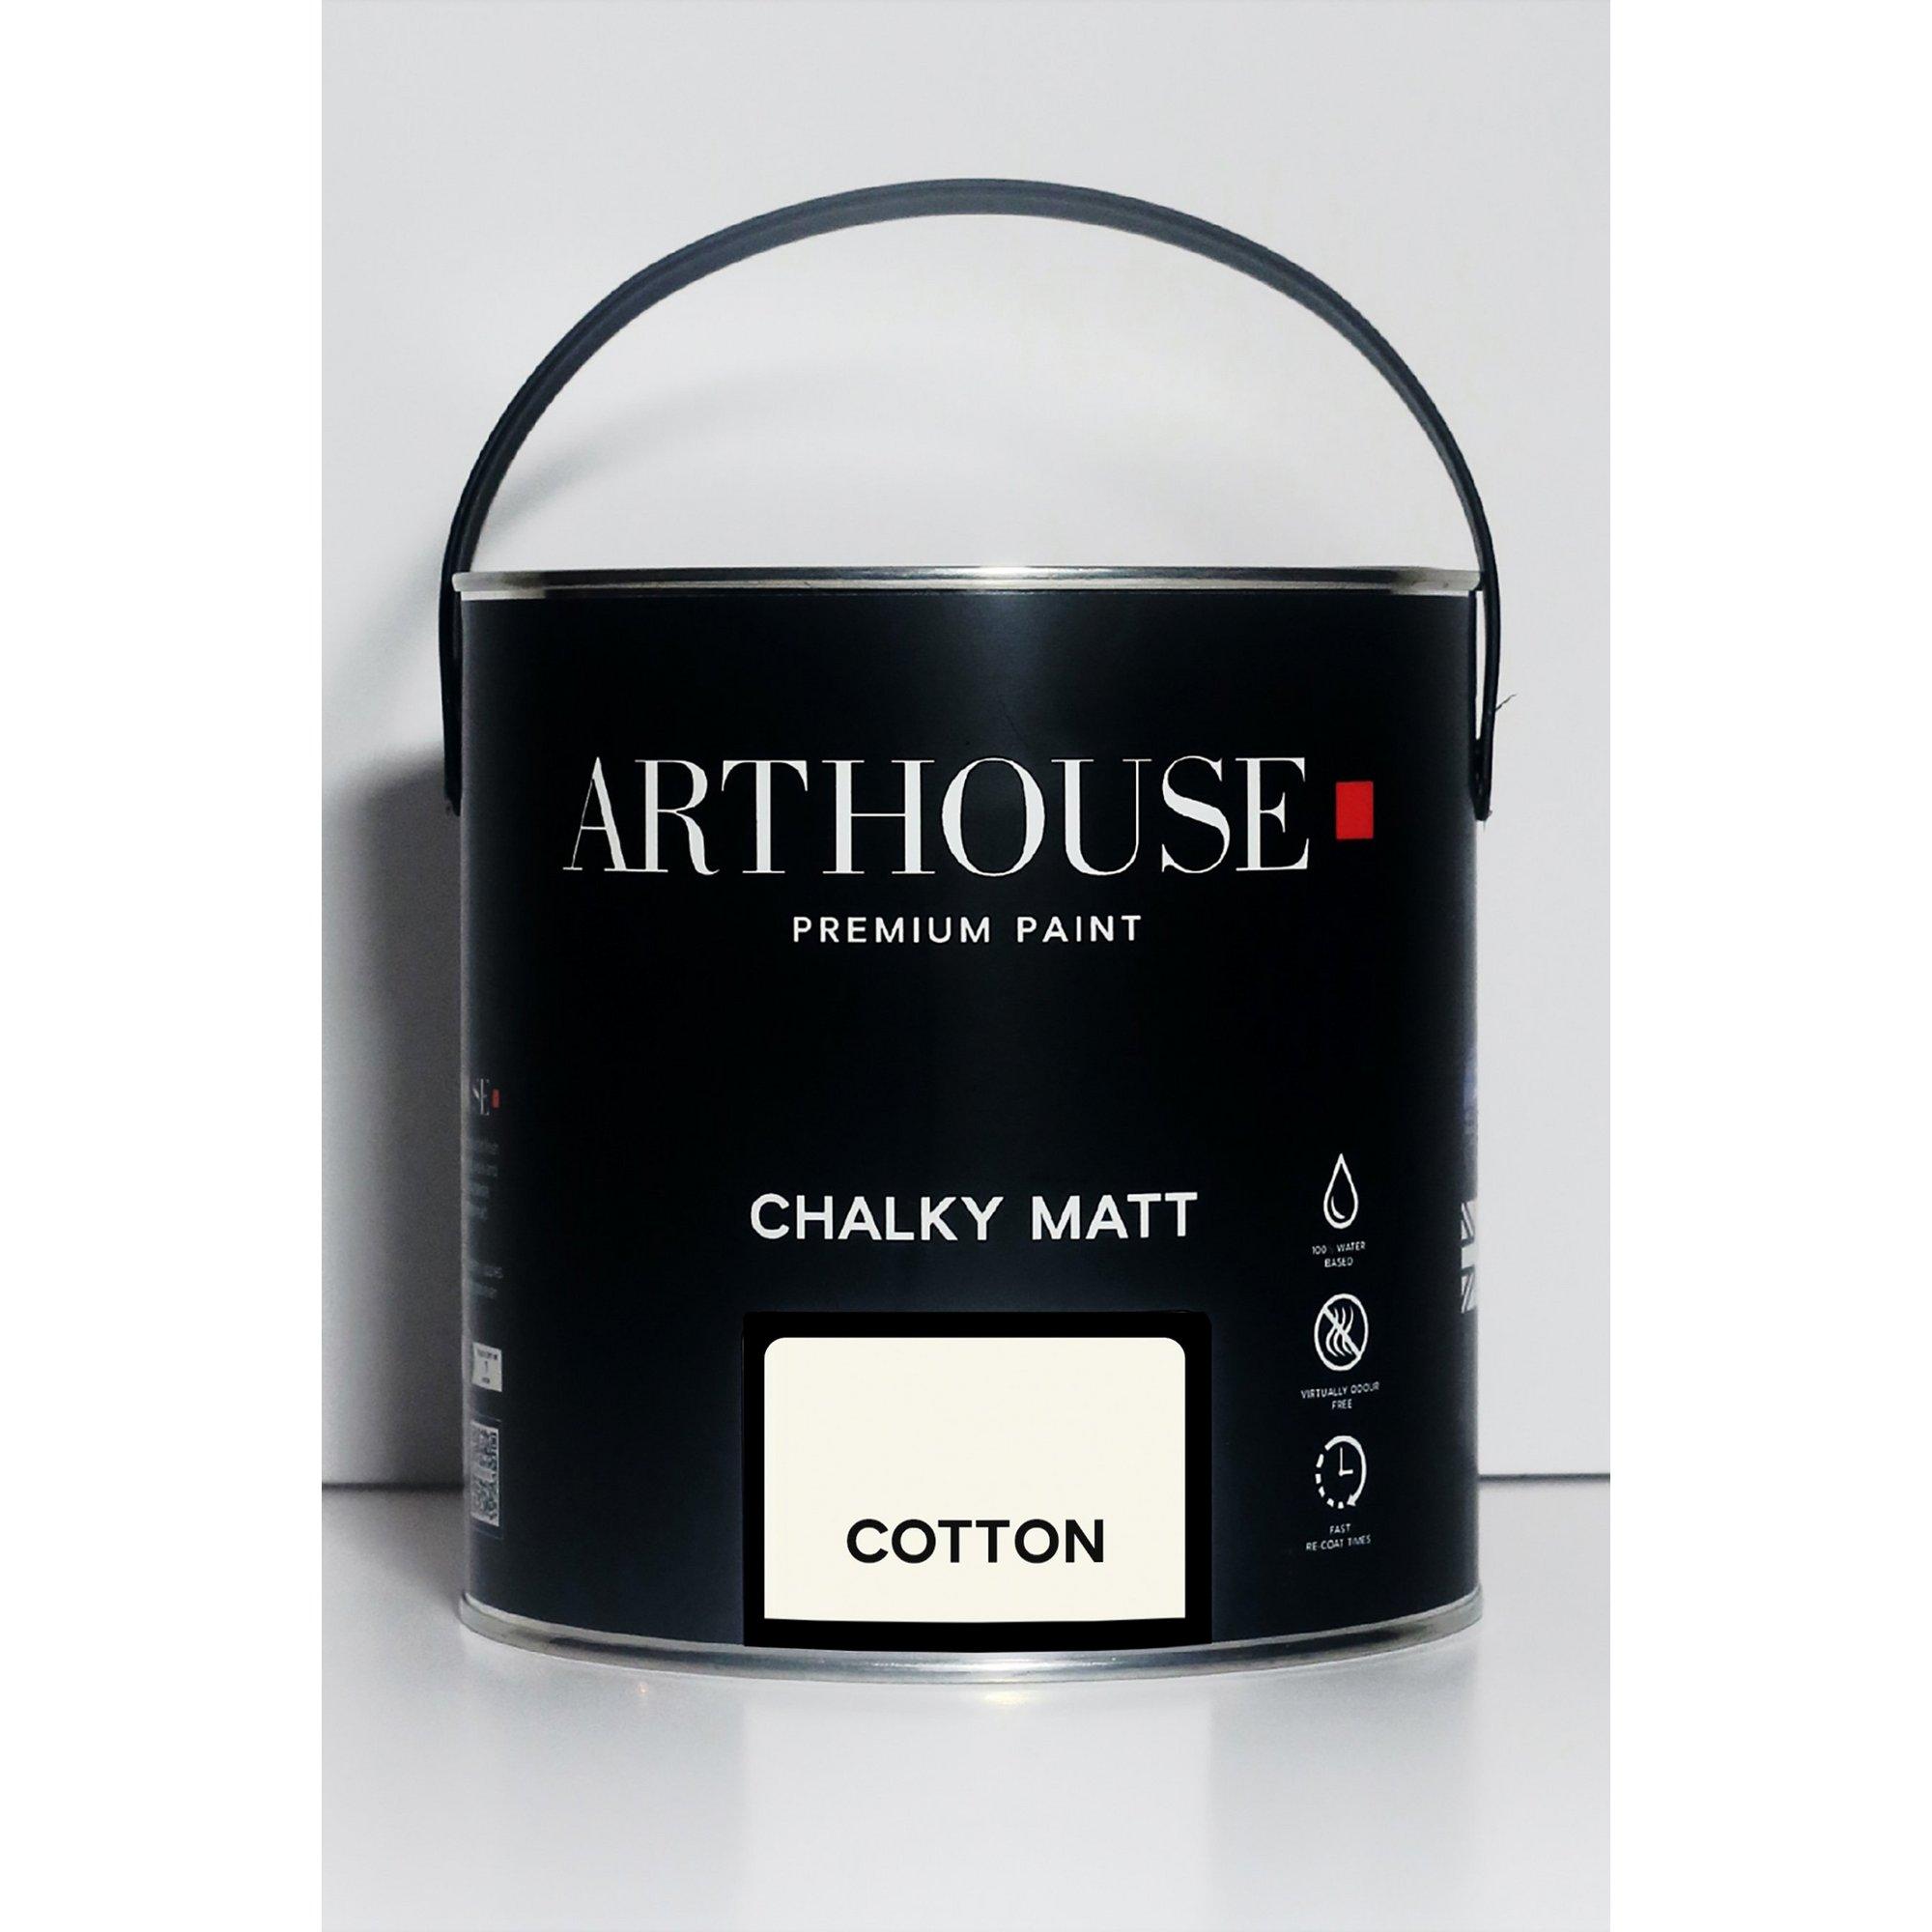 Image of Chalky Matt Cotton Emulsion Paint